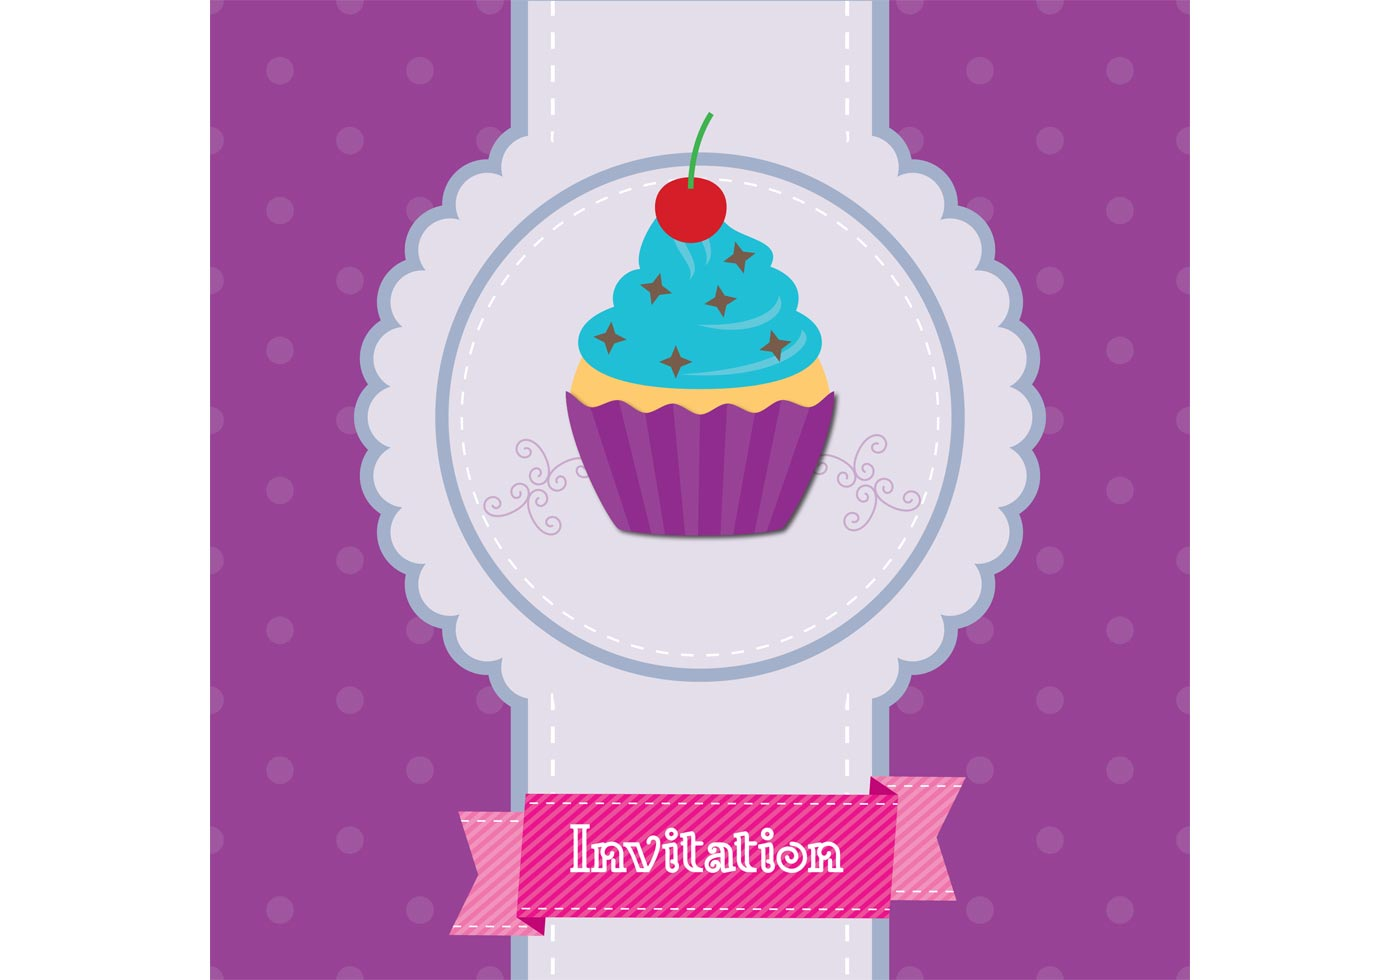 Cupcake Invitation Vector Download Free Vectors Clipart